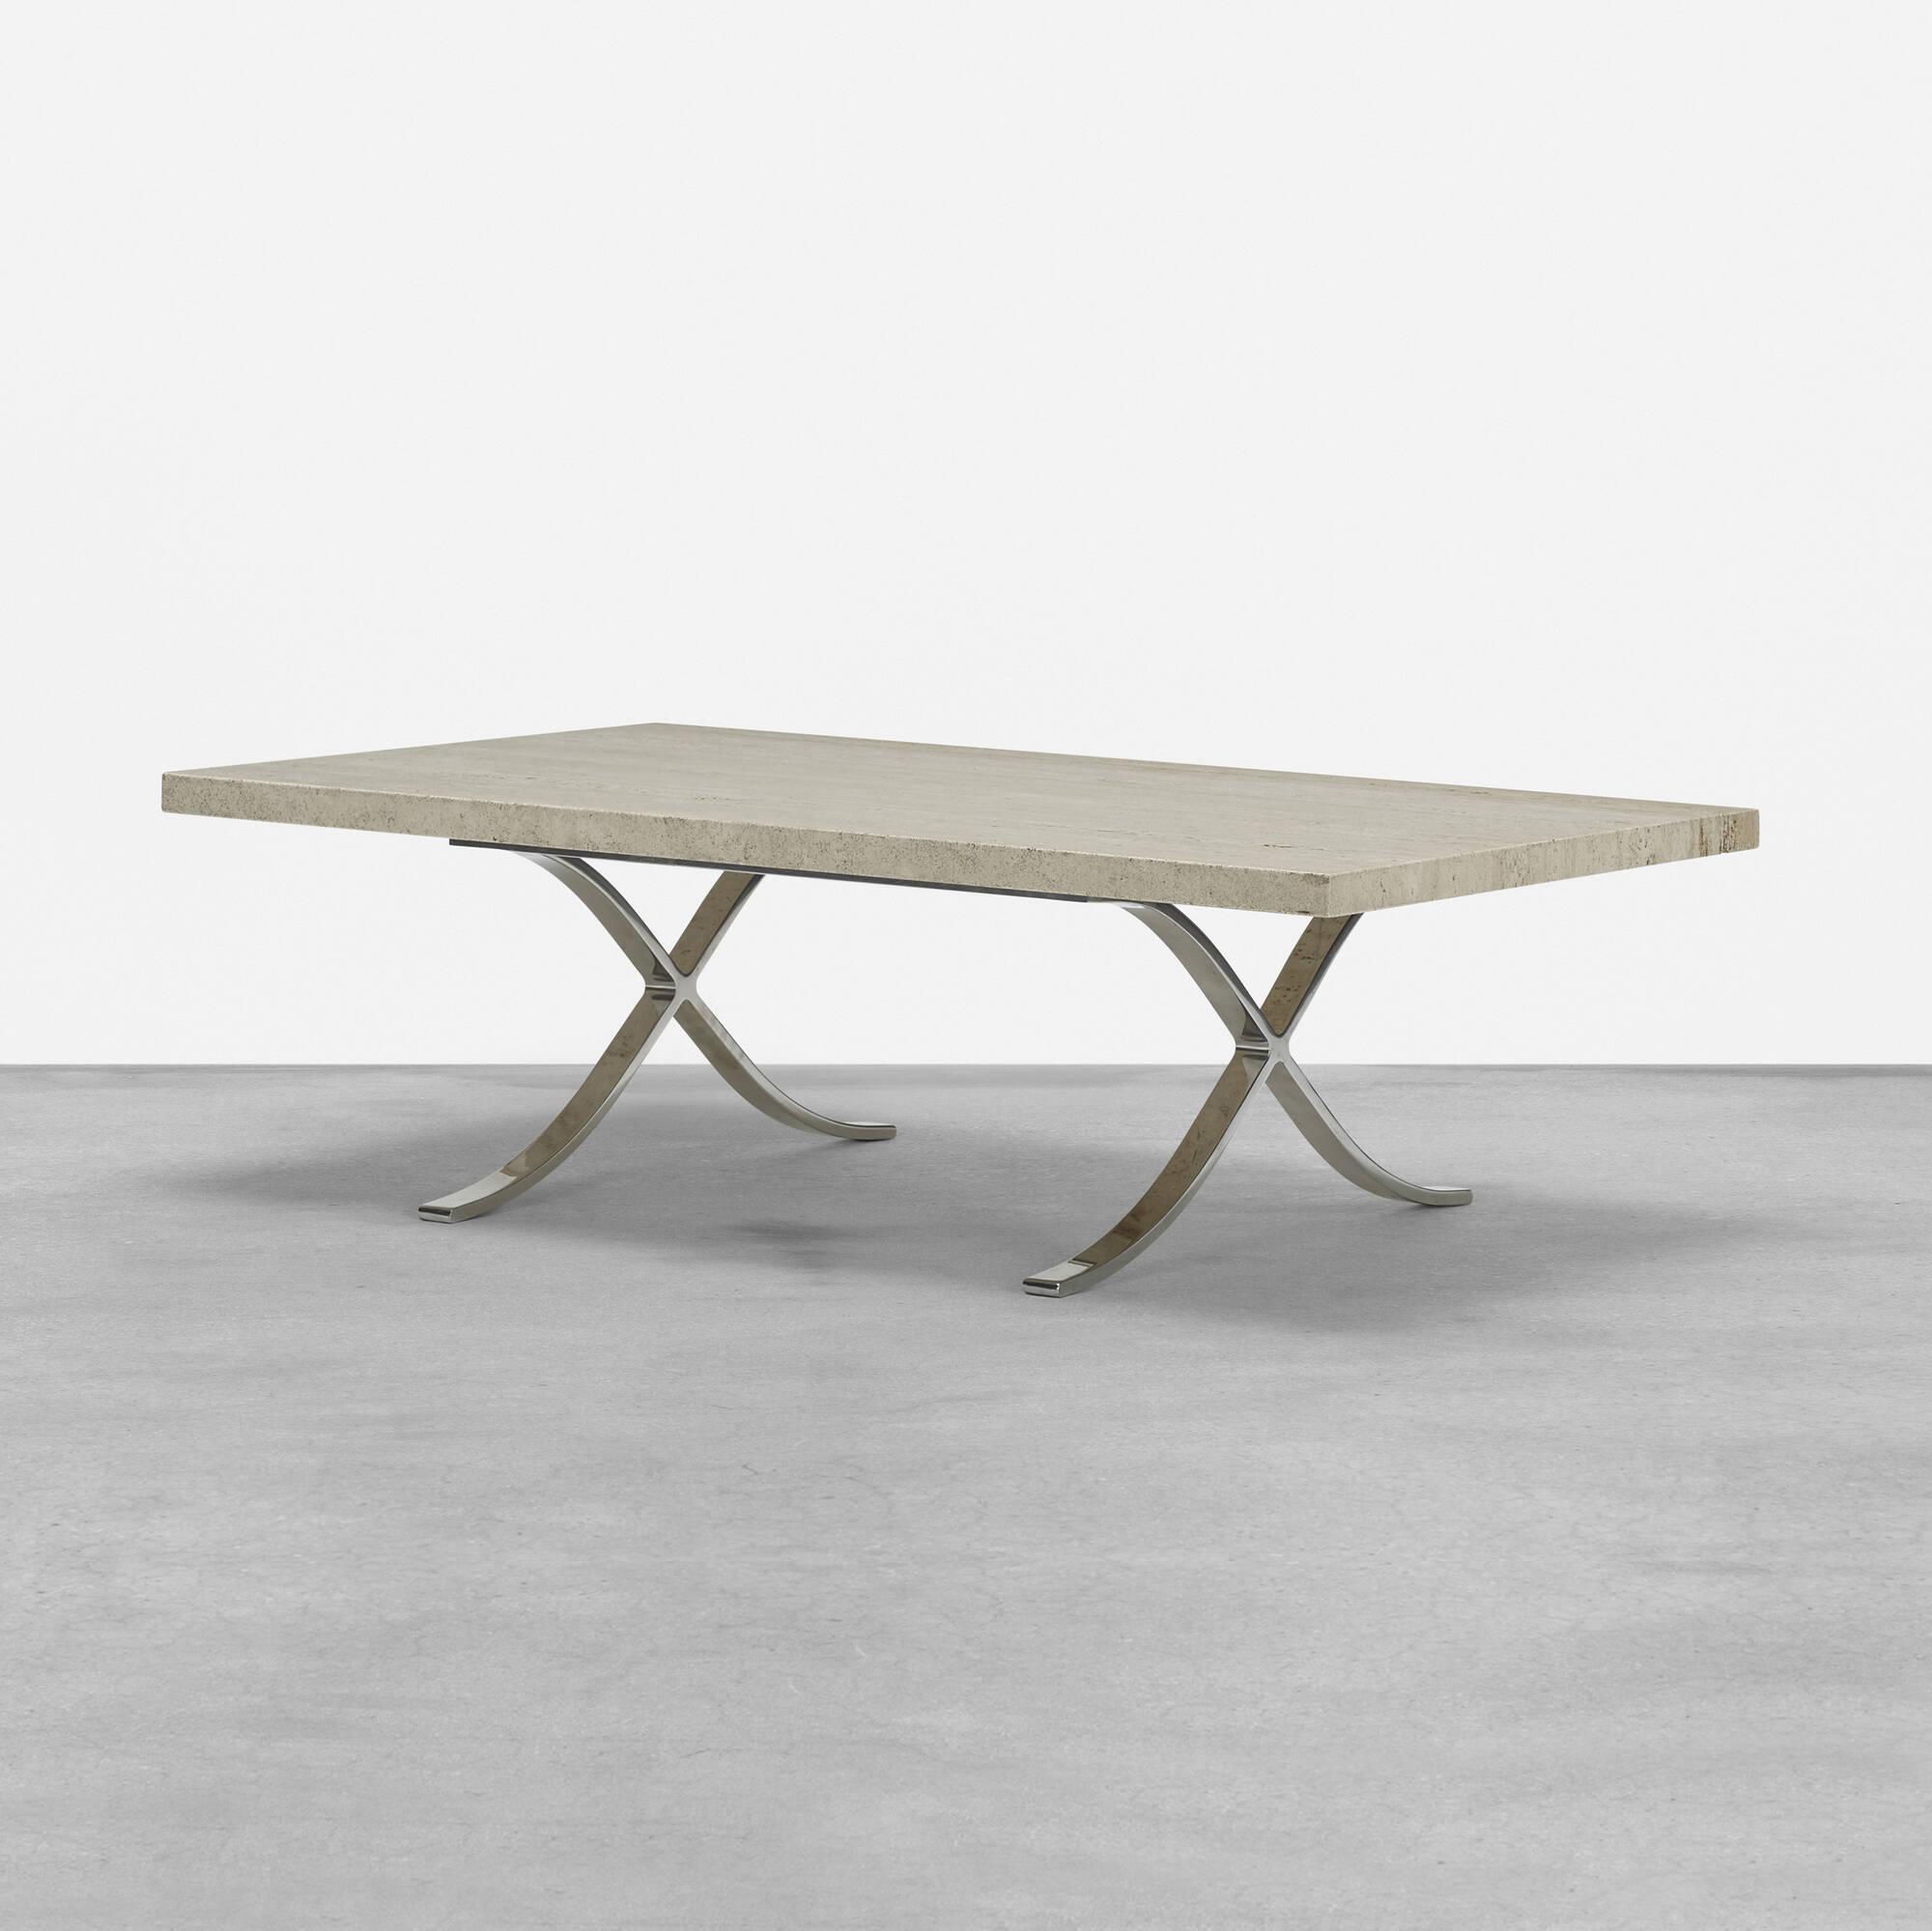 275 Ludwig Mies van der Rohe coffee table Design 11 June